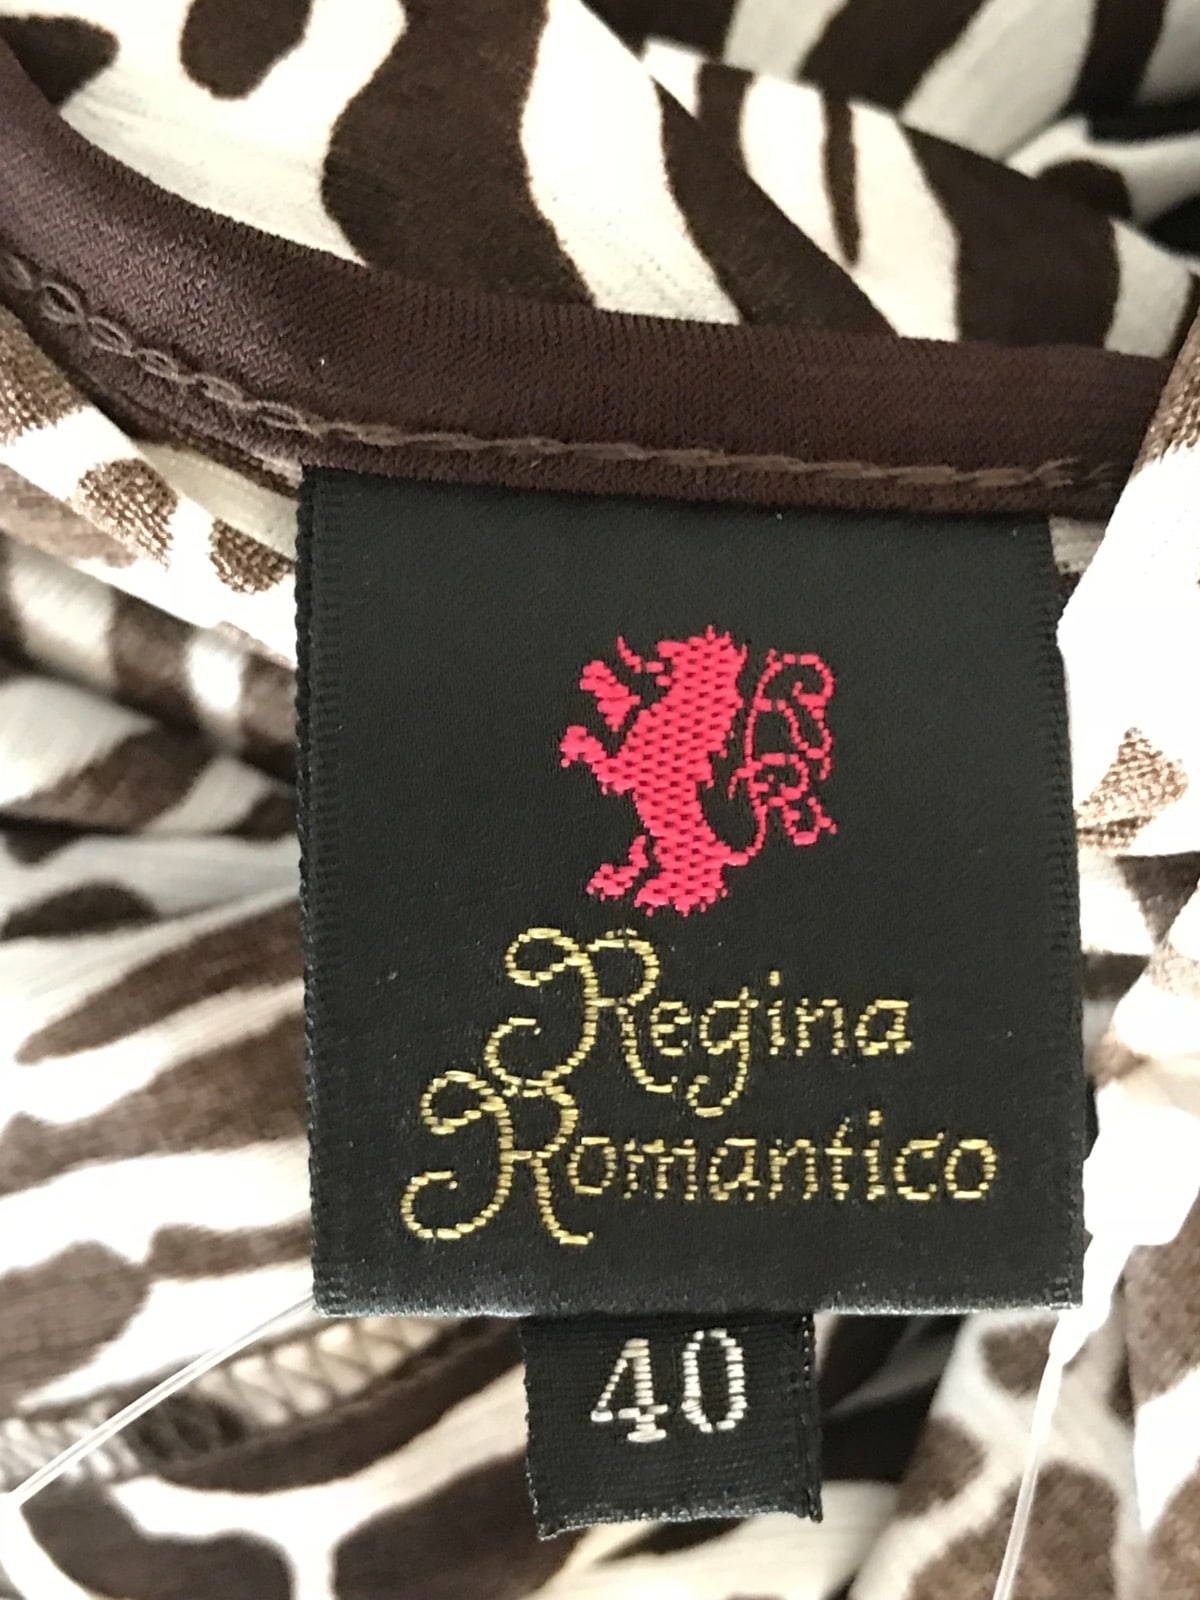 Regina Romantico(レジィーナロマンティコ)のカーディガン